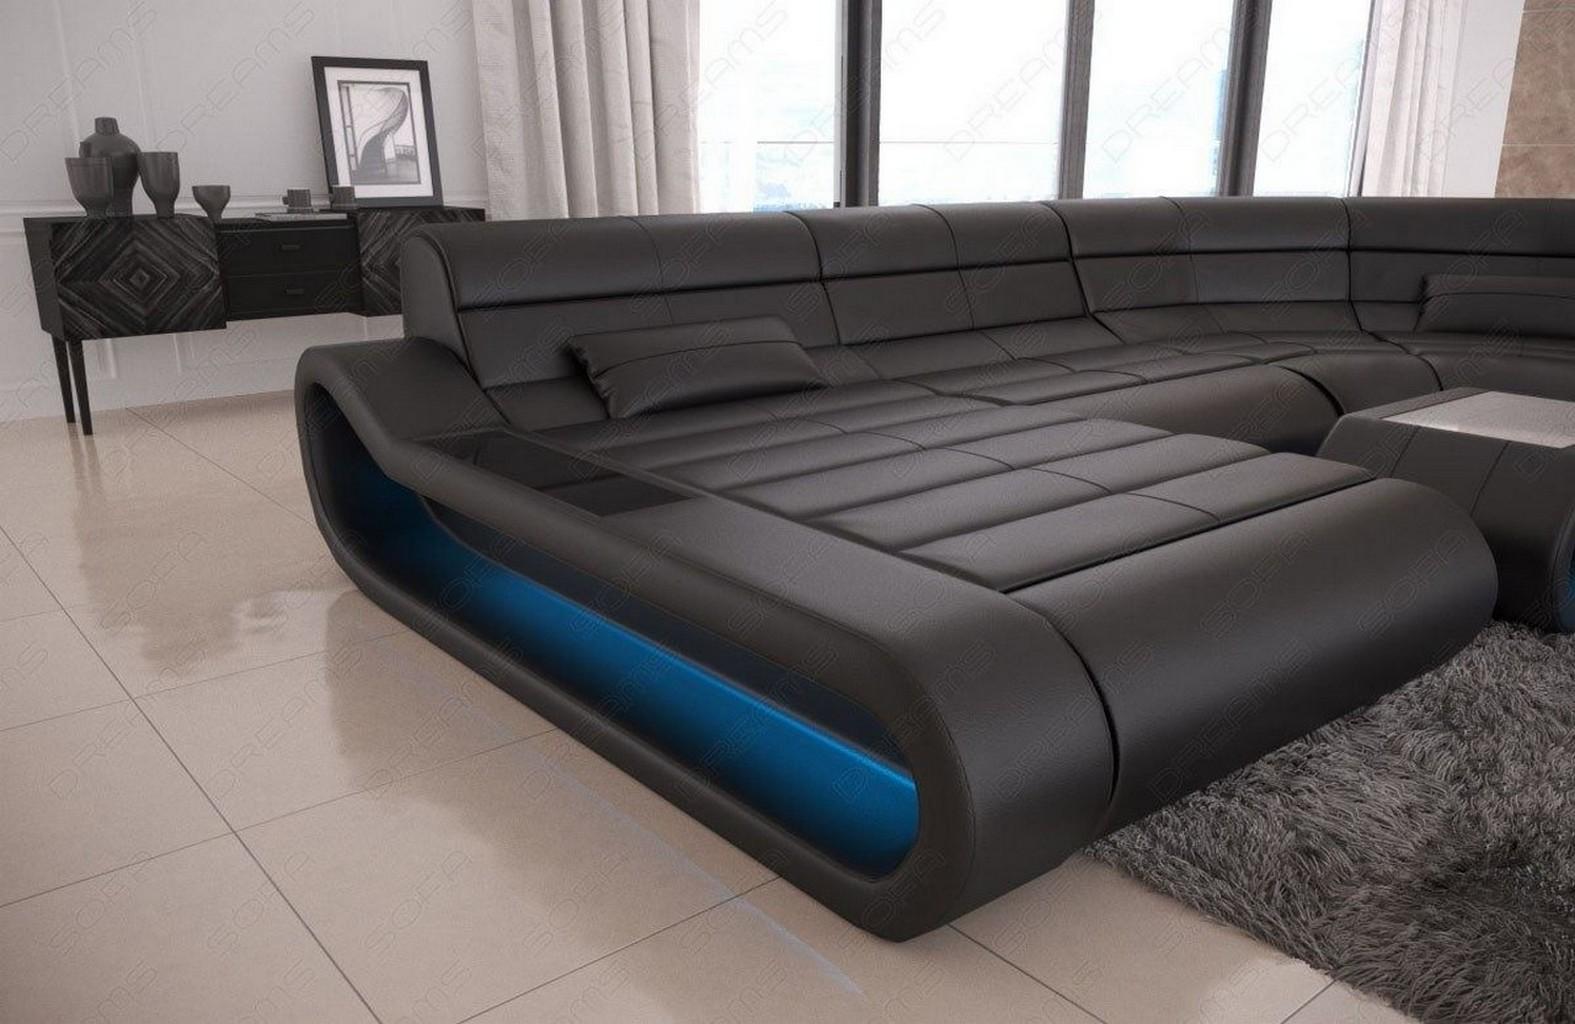 sofa wohnlandschaft leder designercouch eckcouch ottomane concept beleuchtung ebay. Black Bedroom Furniture Sets. Home Design Ideas